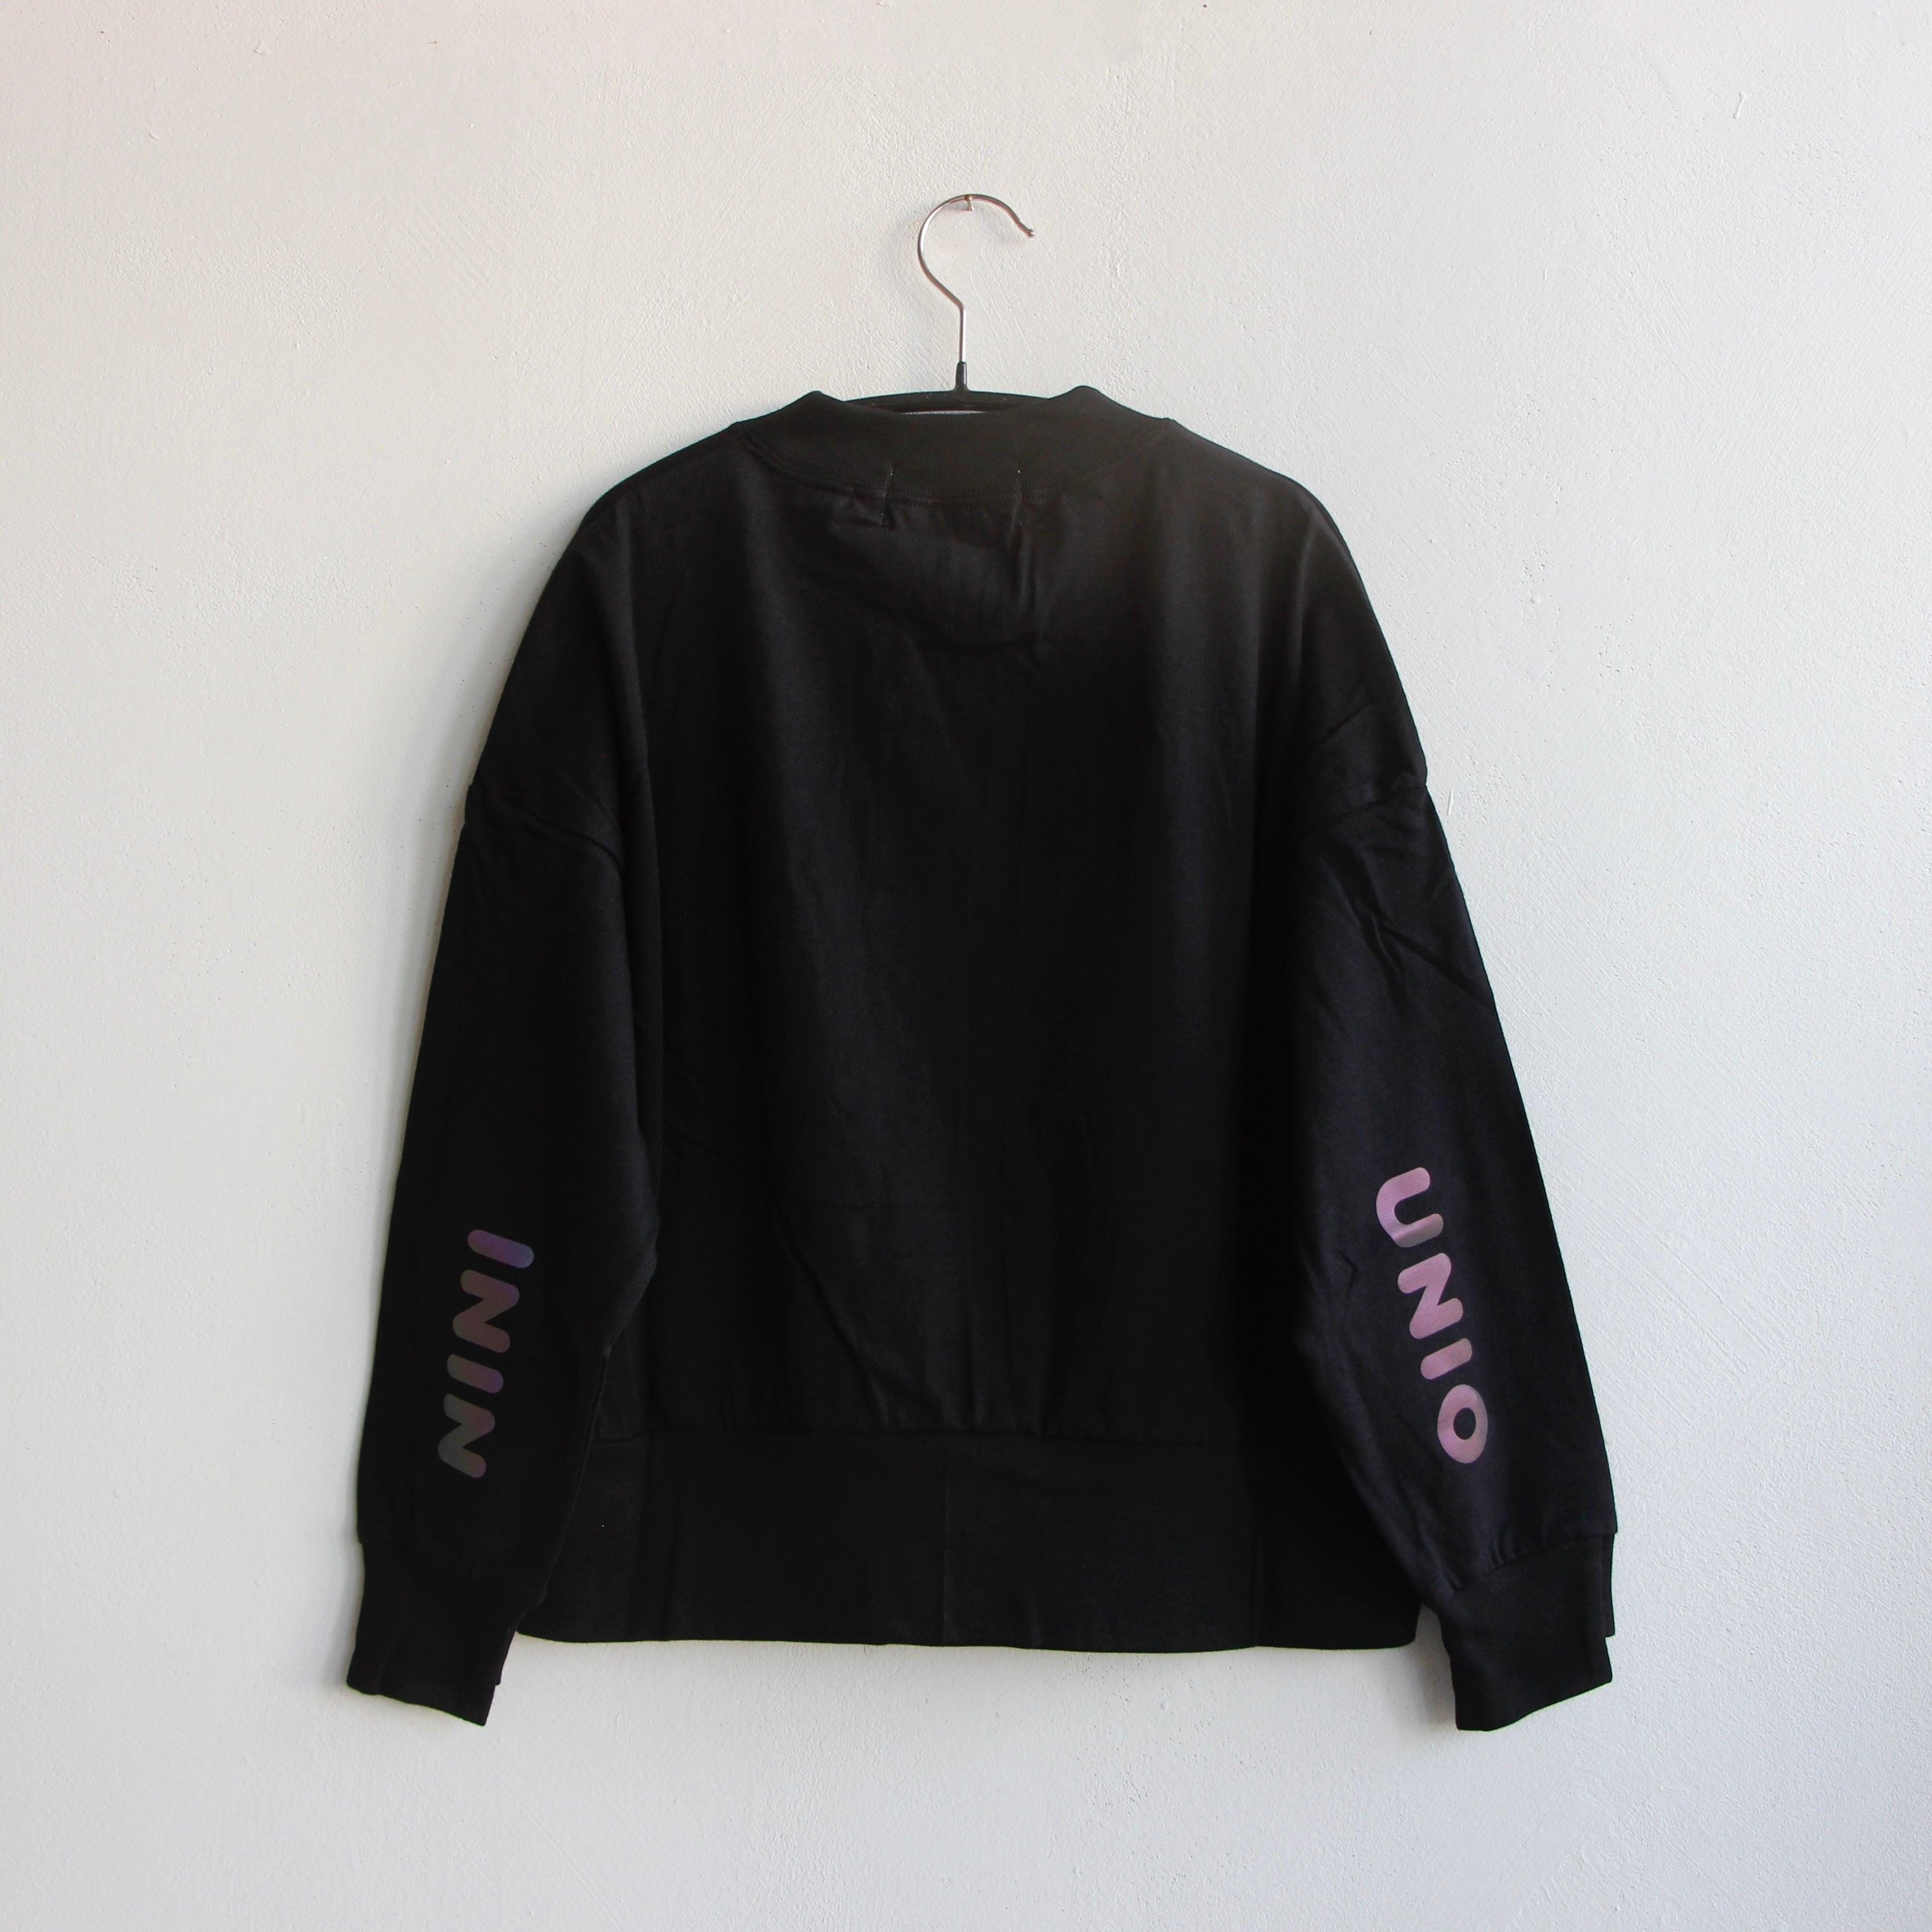 《UNIONINI 2021AW》reflect logo long sleeved tee /  black / 2-12Y